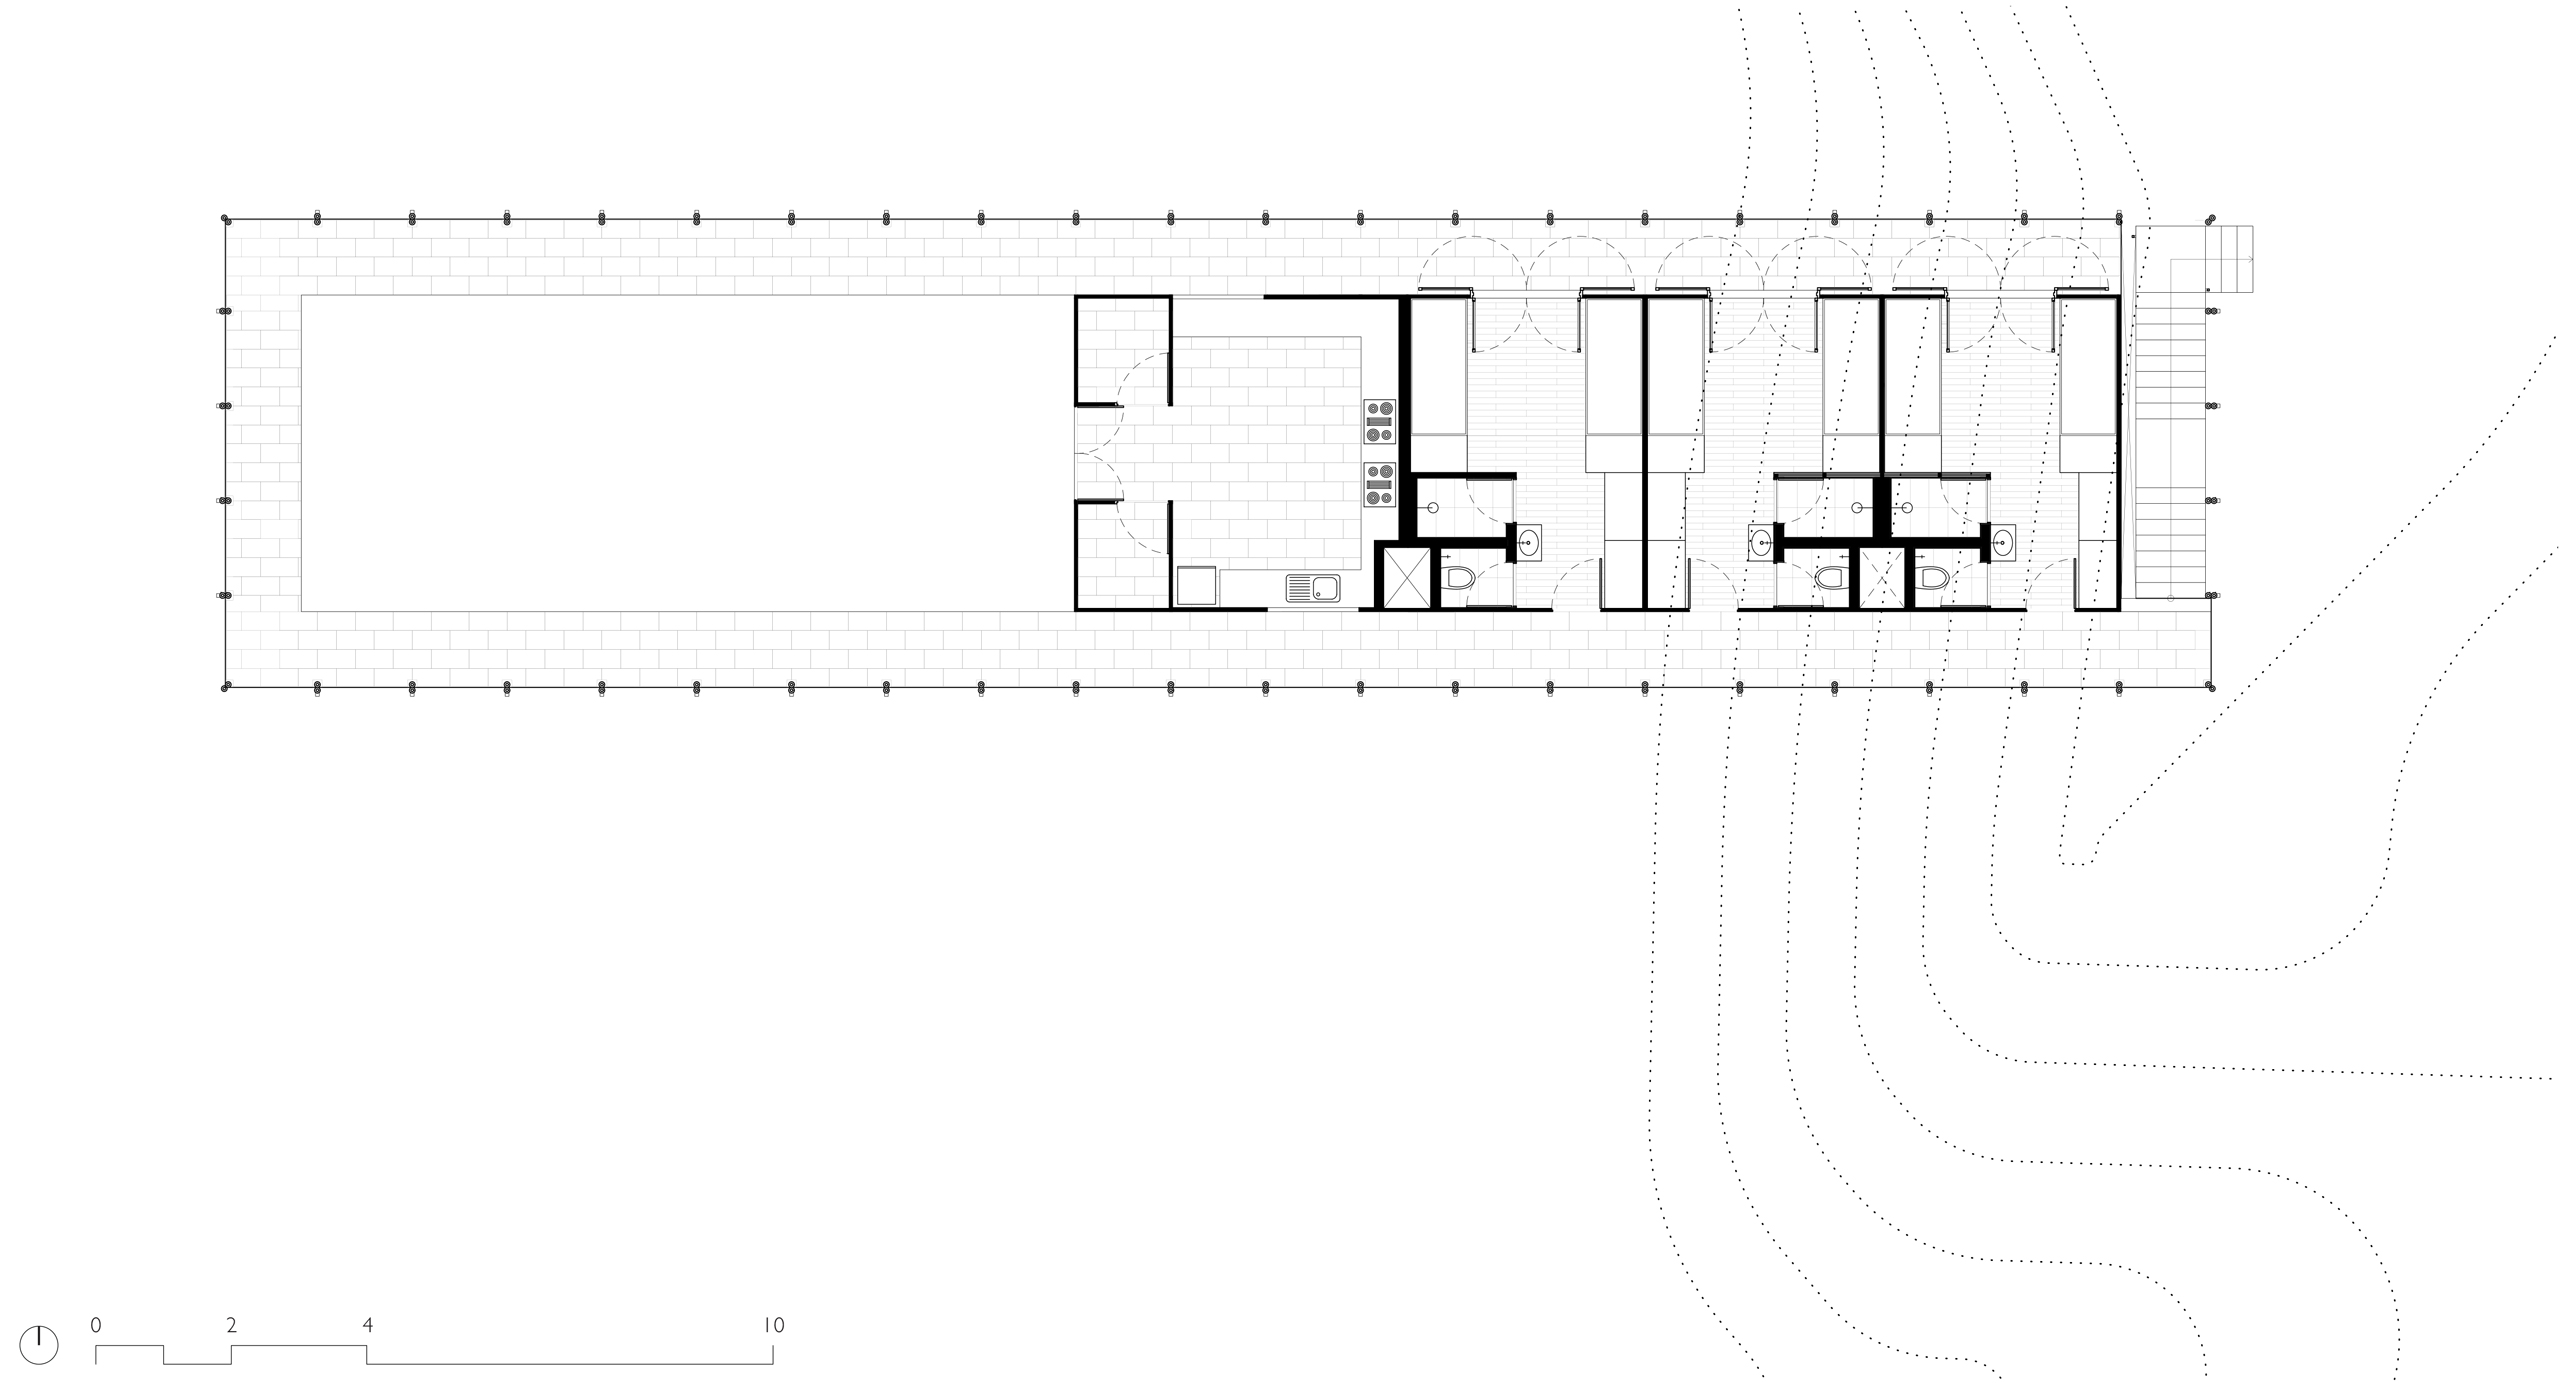 Floor Plan of Magic Bus Dormitory, Karjat